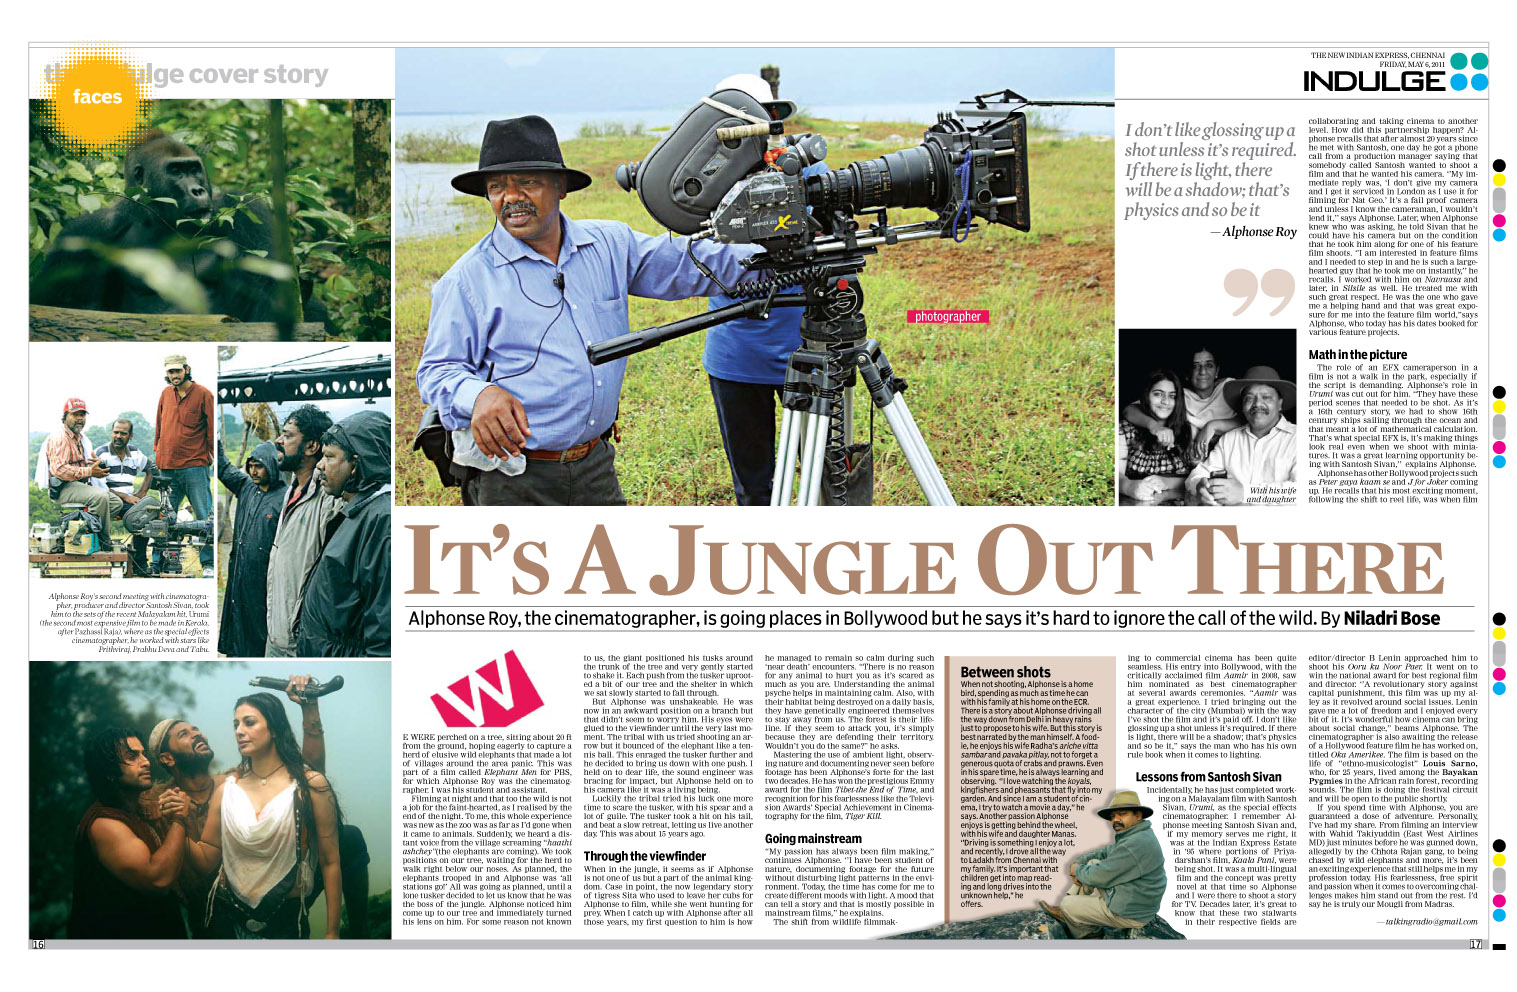 Niladri Bose: The Indian Express Chennai Indulge Cover Story 06/05/2011